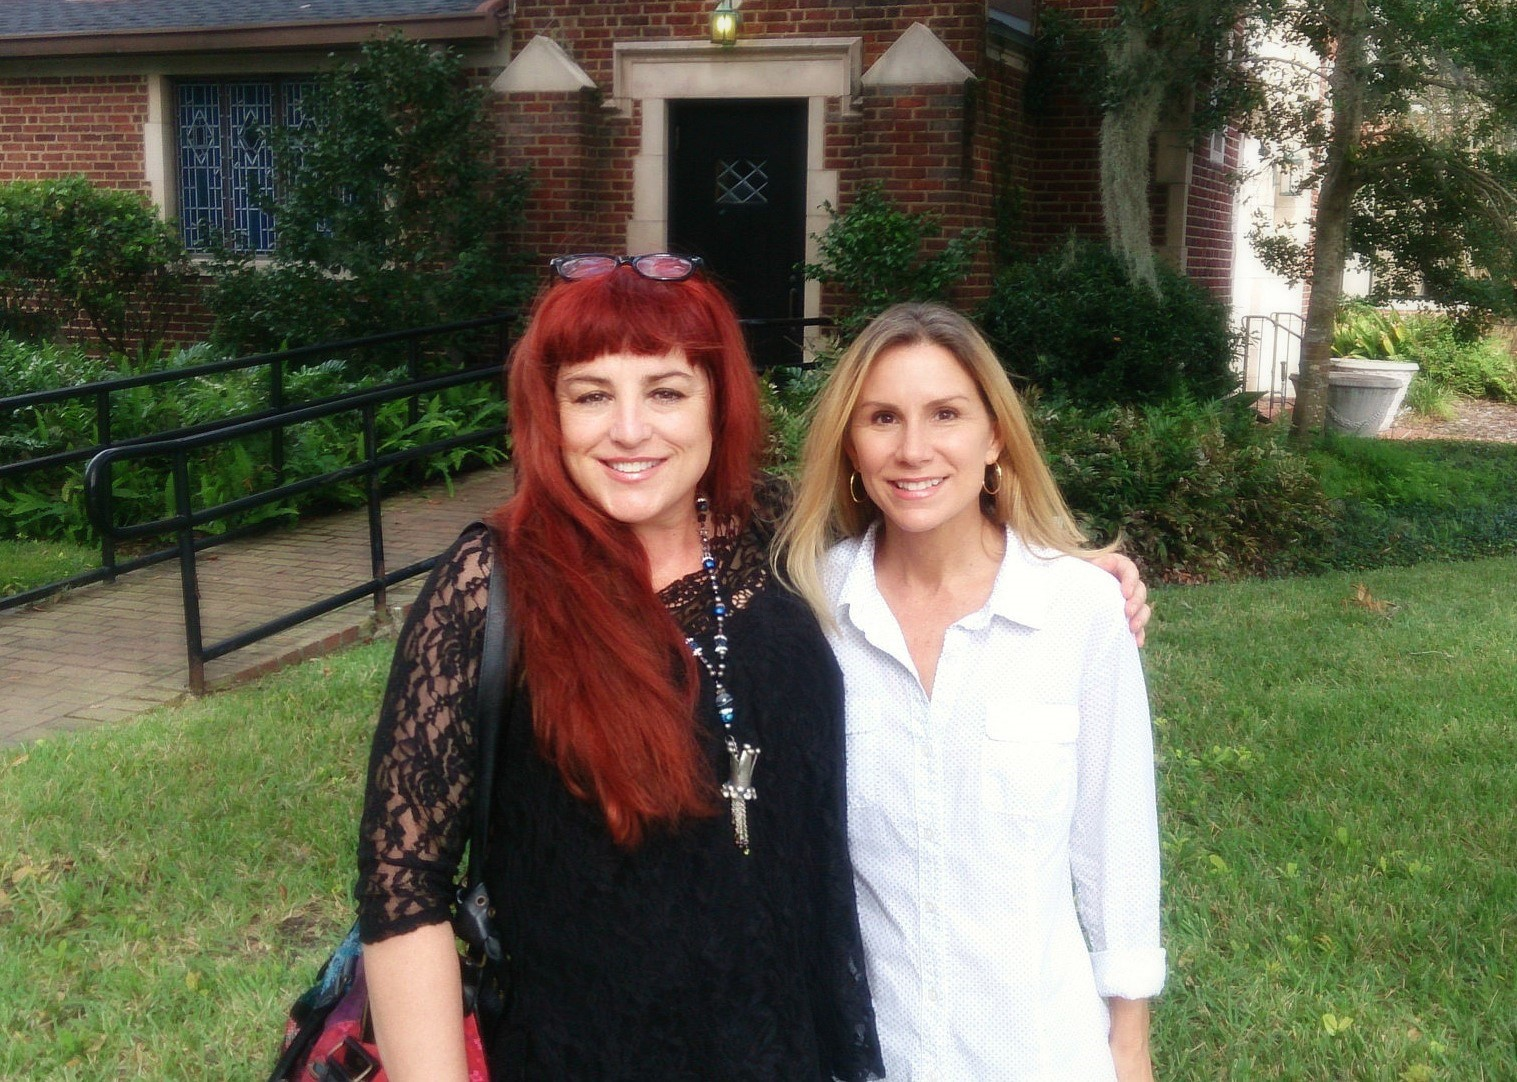 Artist friends Caroline Daley & Gigi Reinette